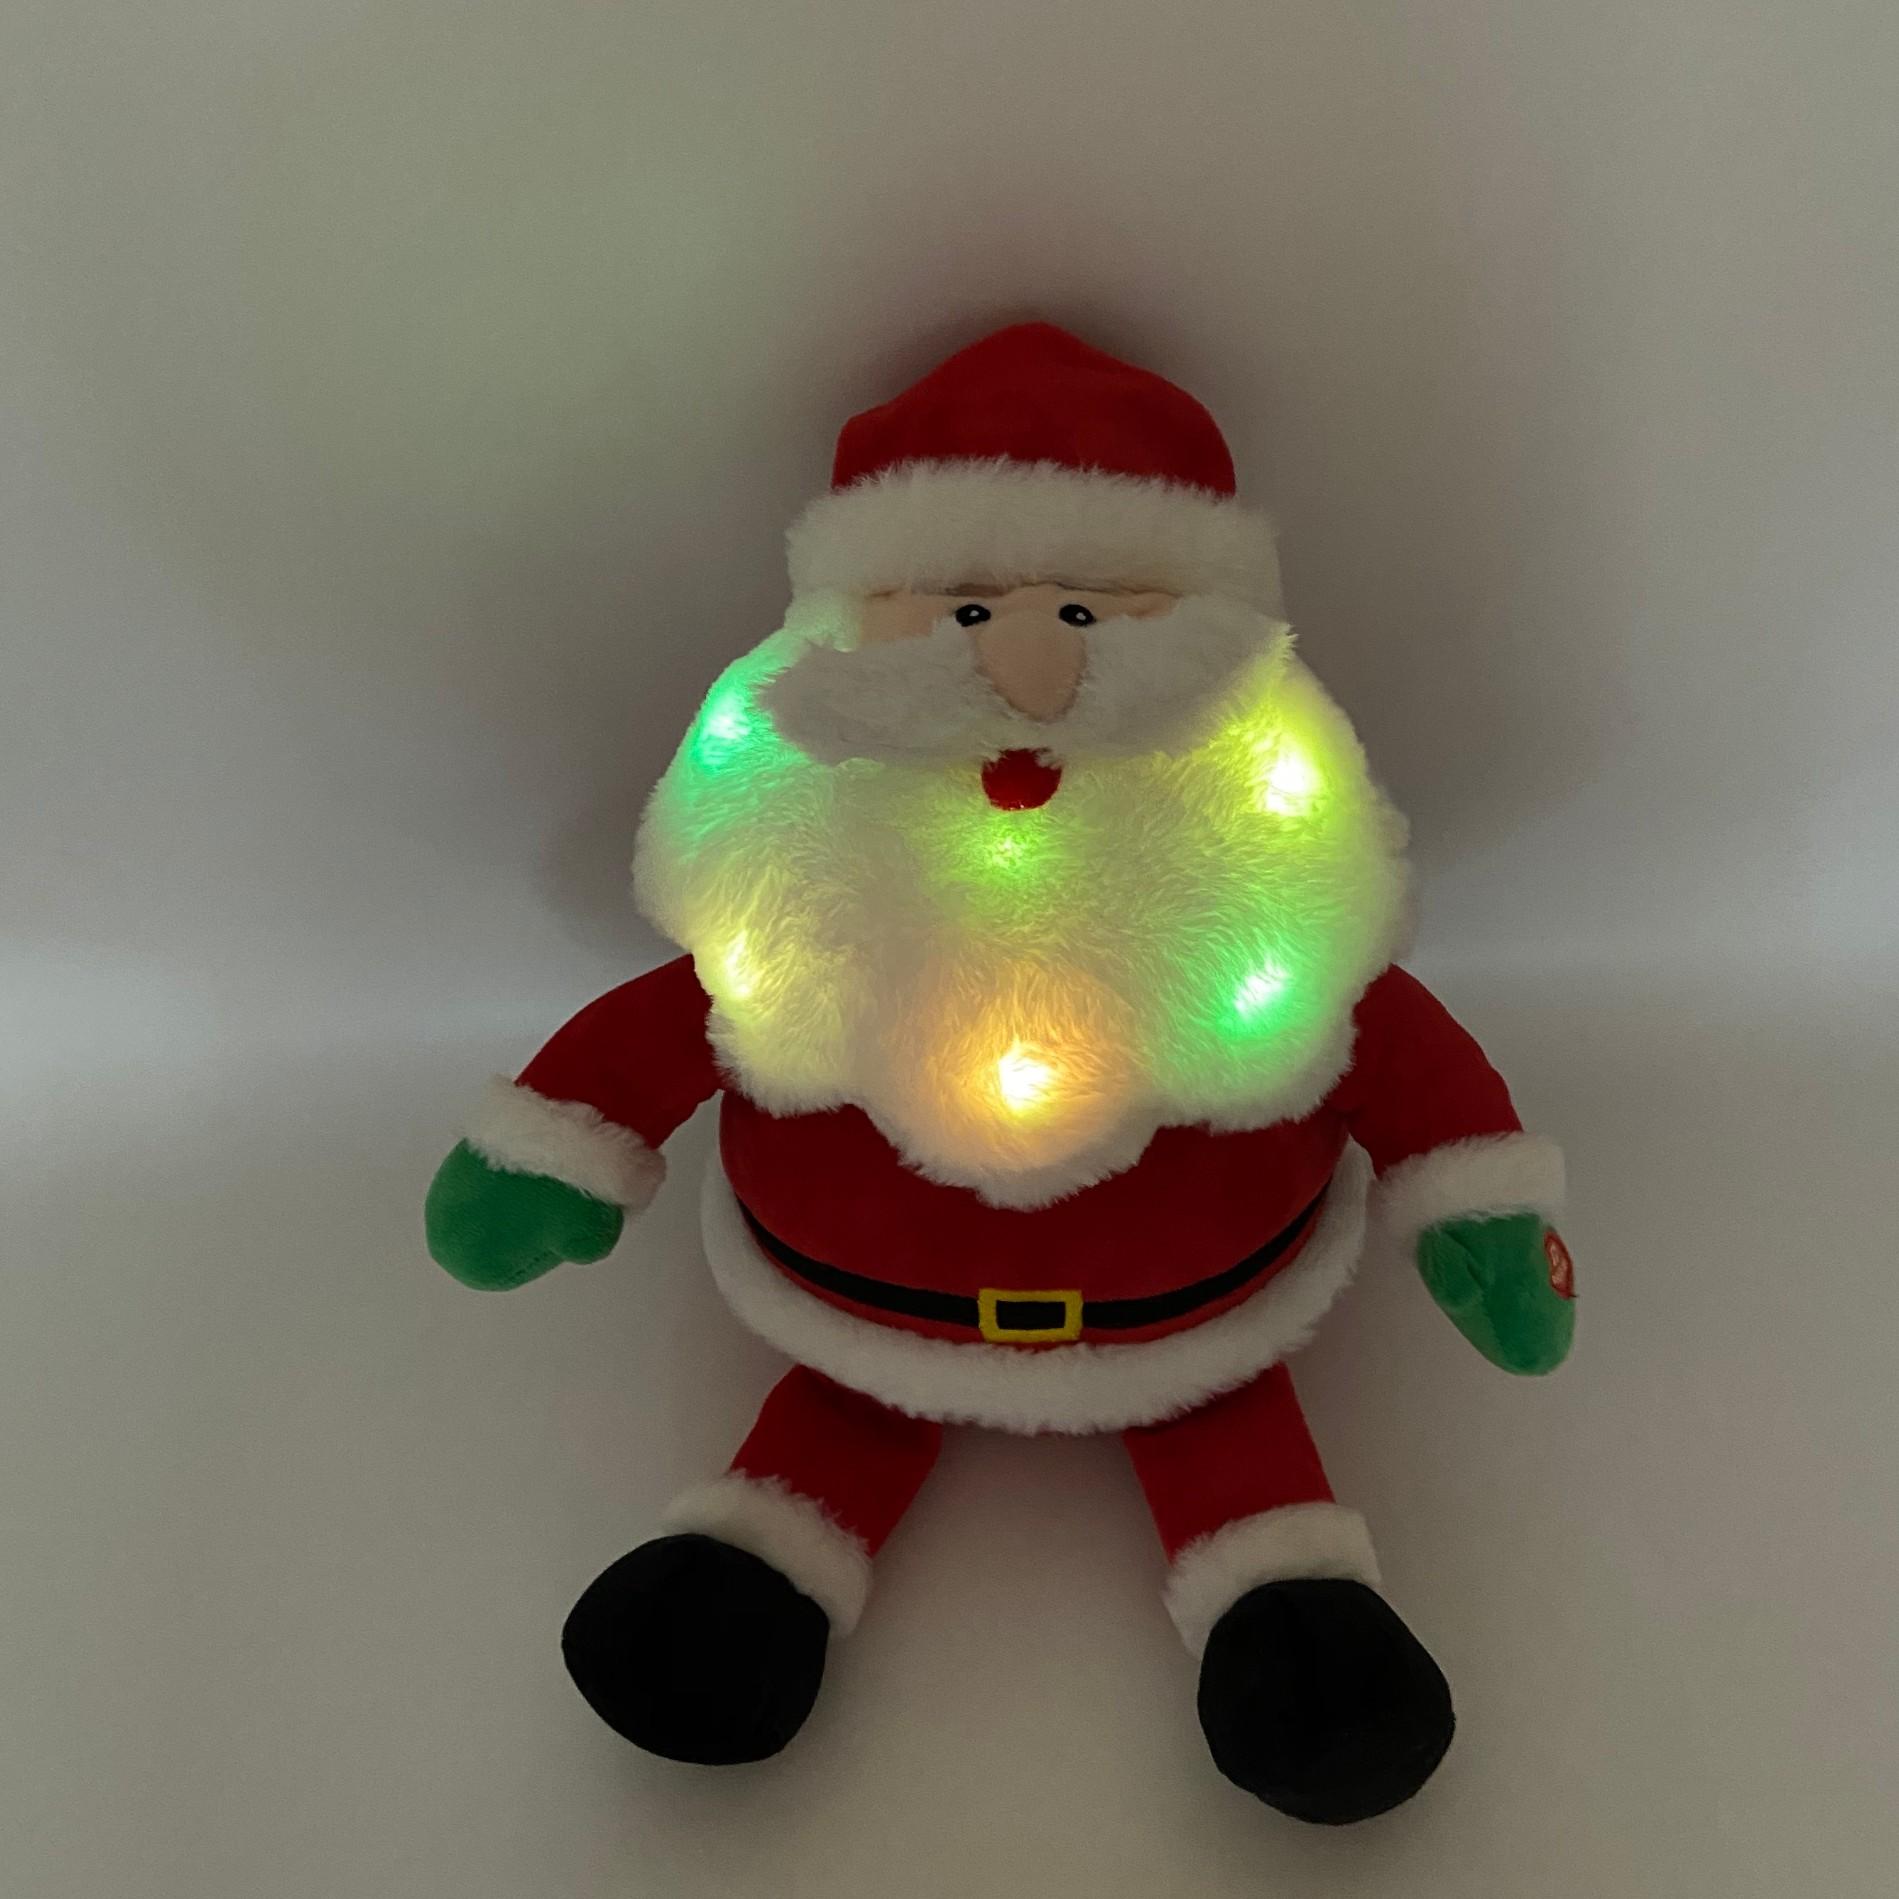 Plush Santa And Reindeer With LED Lights Manufacturers, Plush Santa And Reindeer With LED Lights Factory, Supply Plush Santa And Reindeer With LED Lights